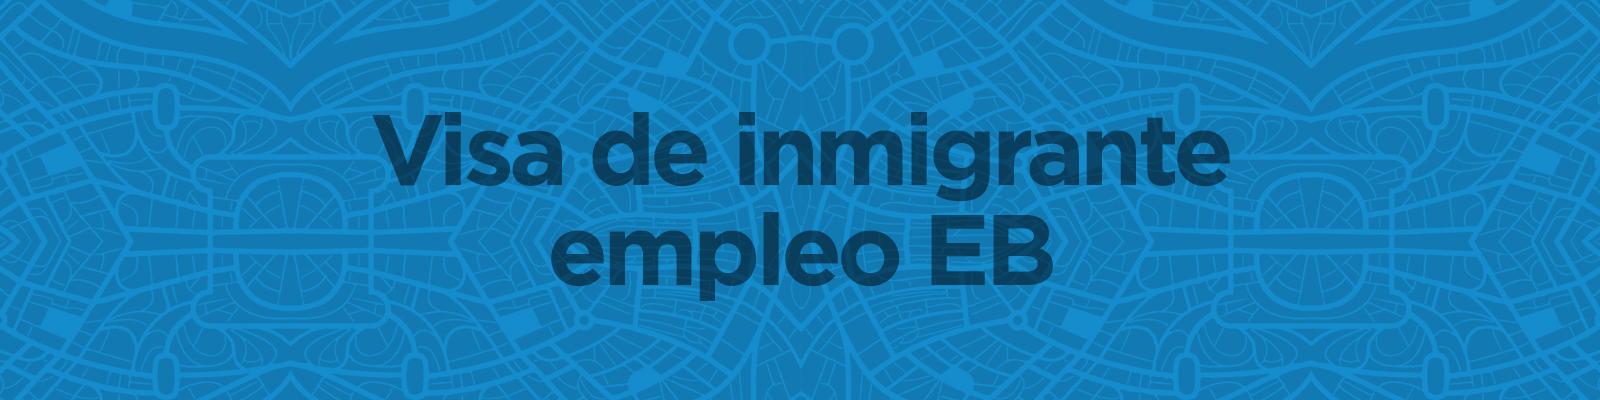 VisaDeInmigranteEB